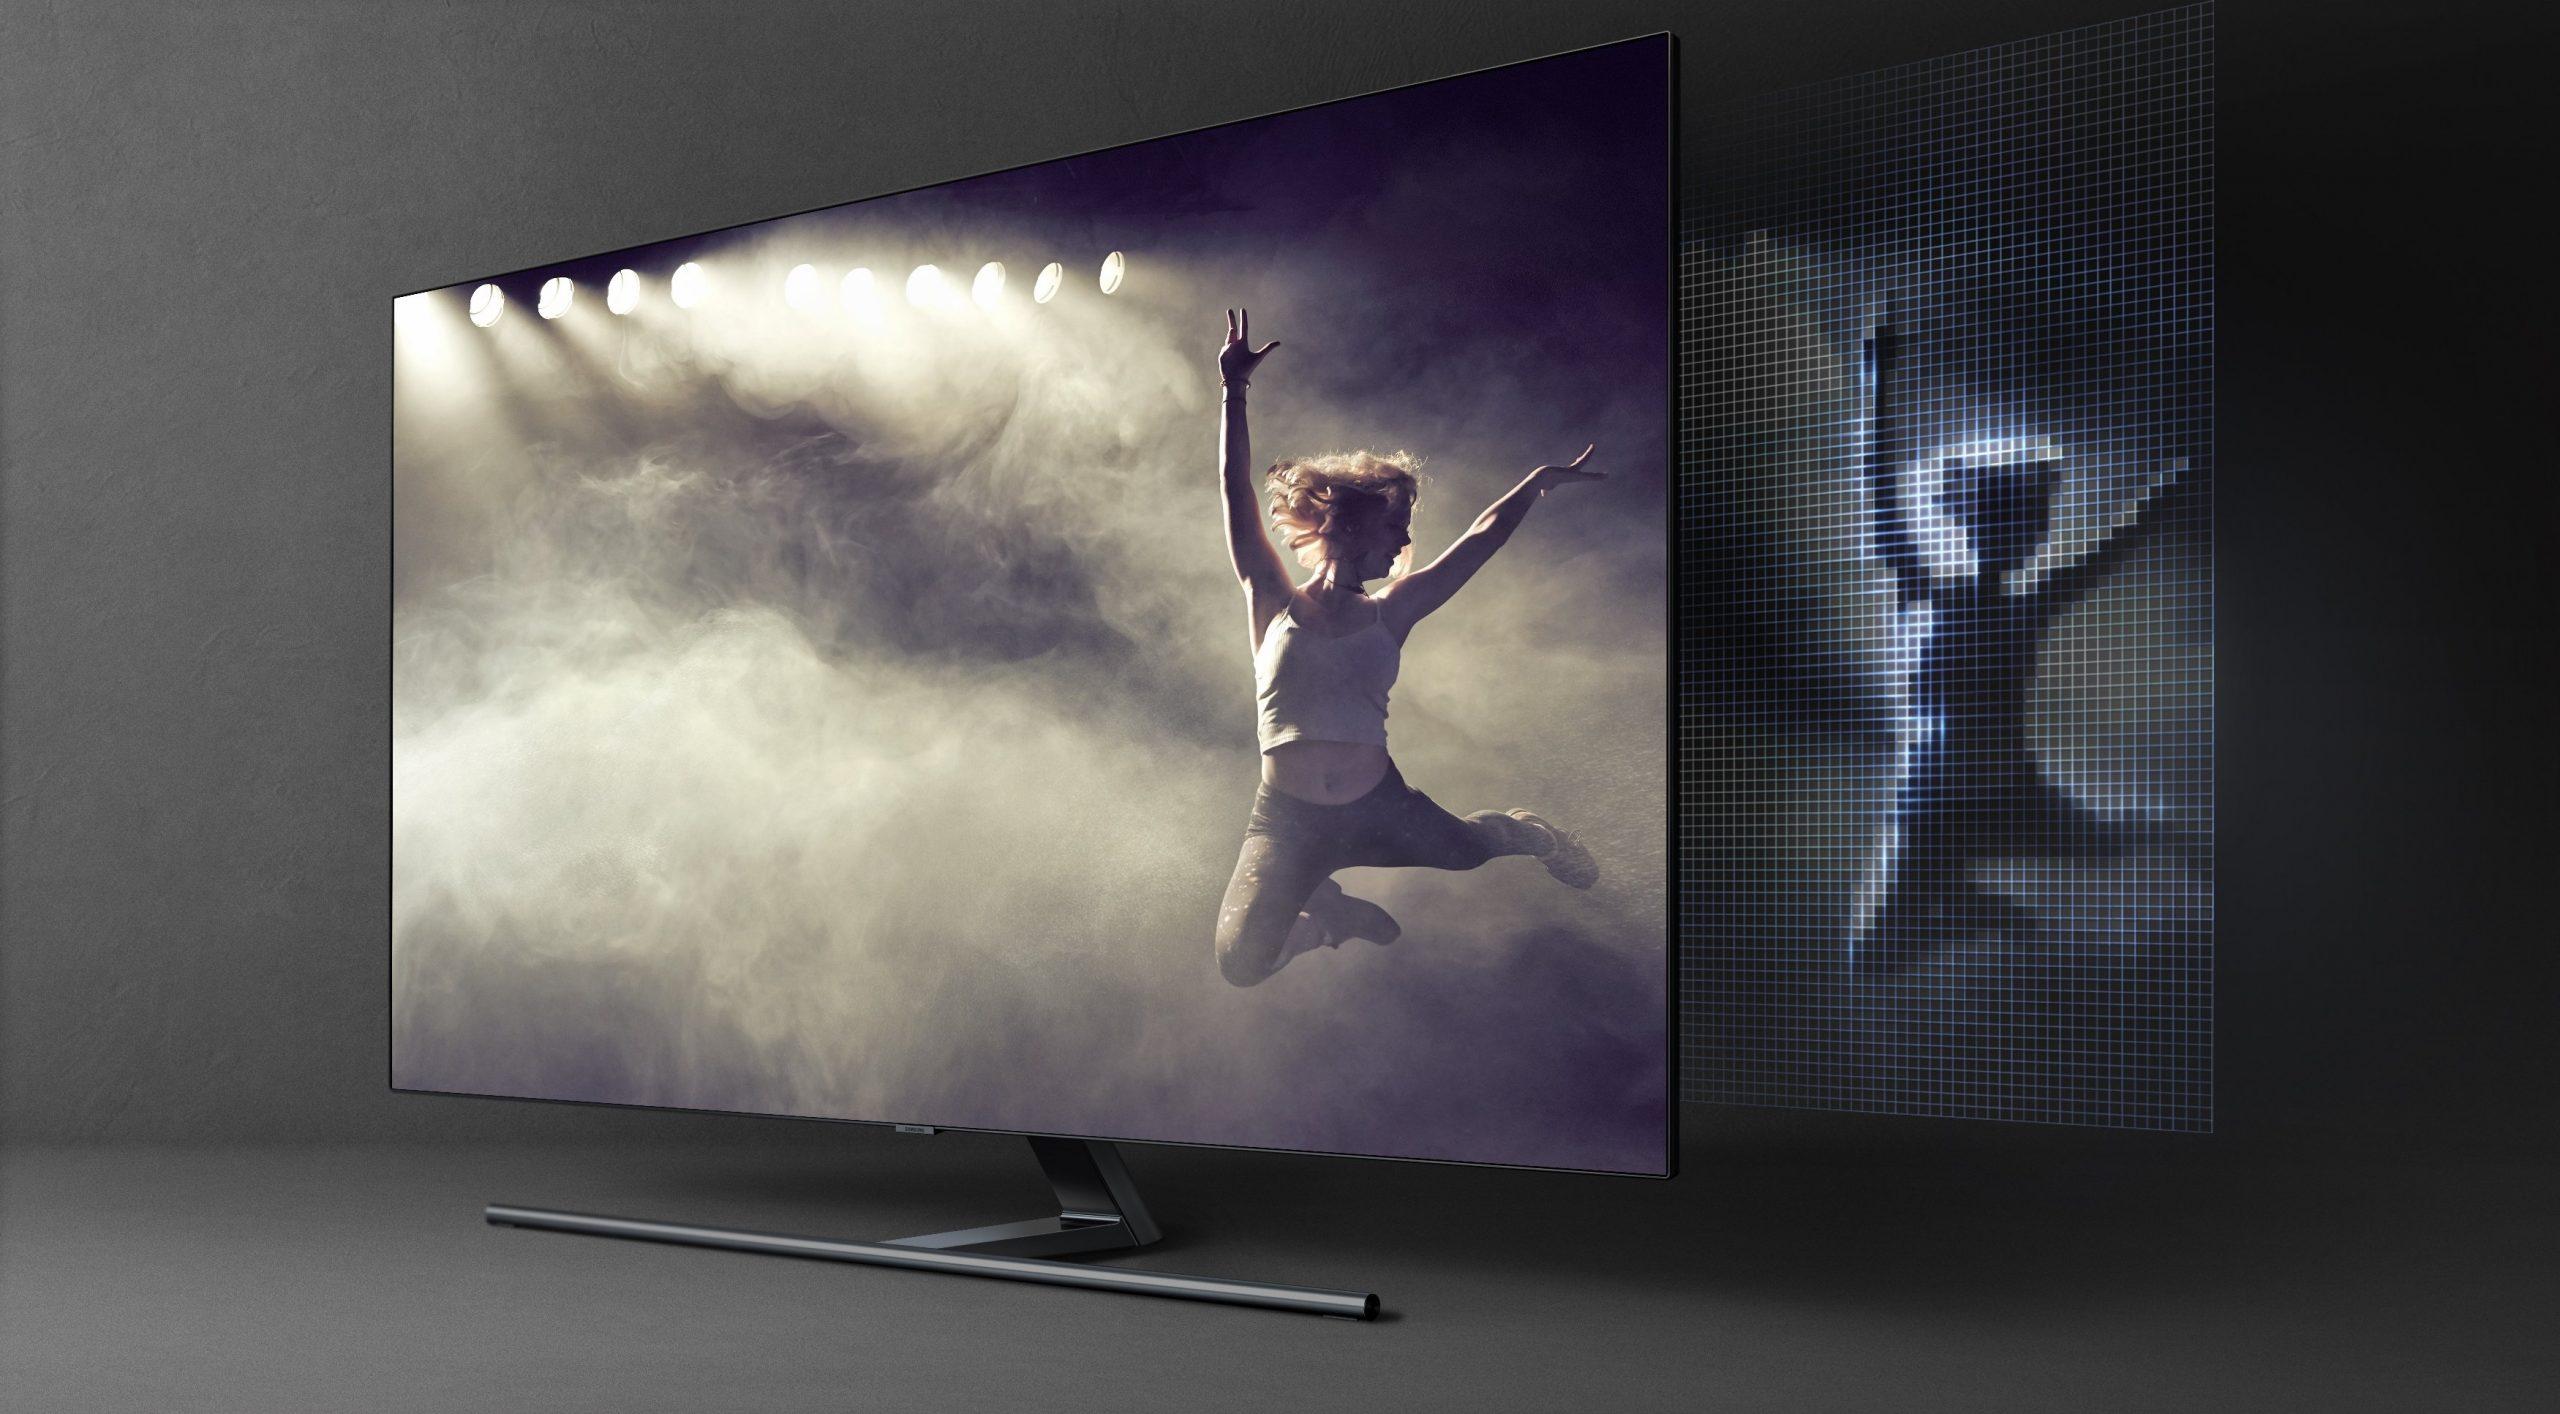 Full Review: Samsung Q9FN 65 inch Smart QLED TV   LiveatPC